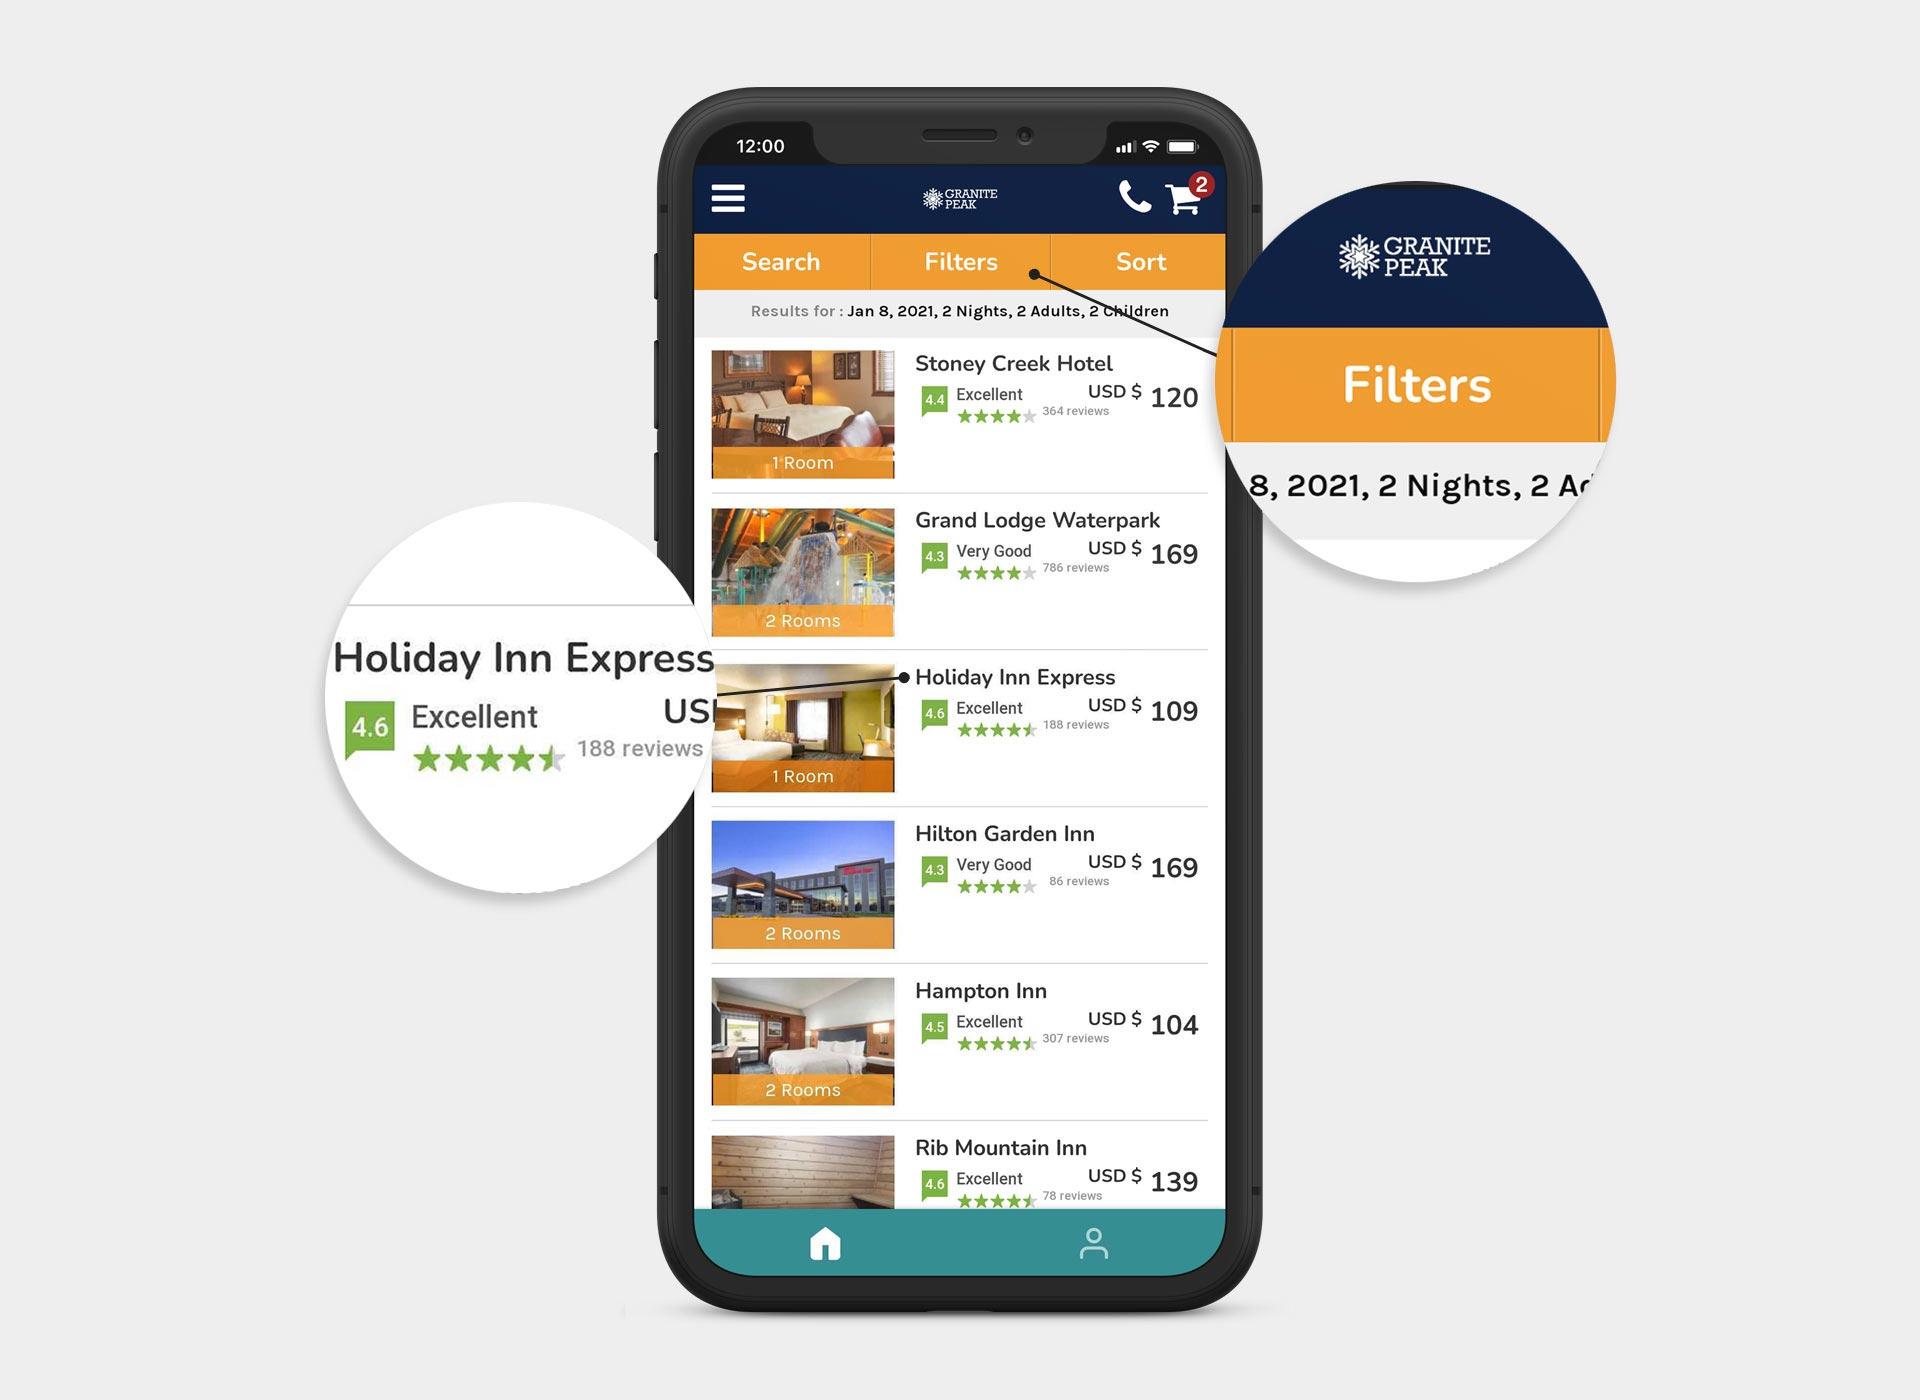 Mobile Apps Application Development Company Builder Tracking Design Creator App 2